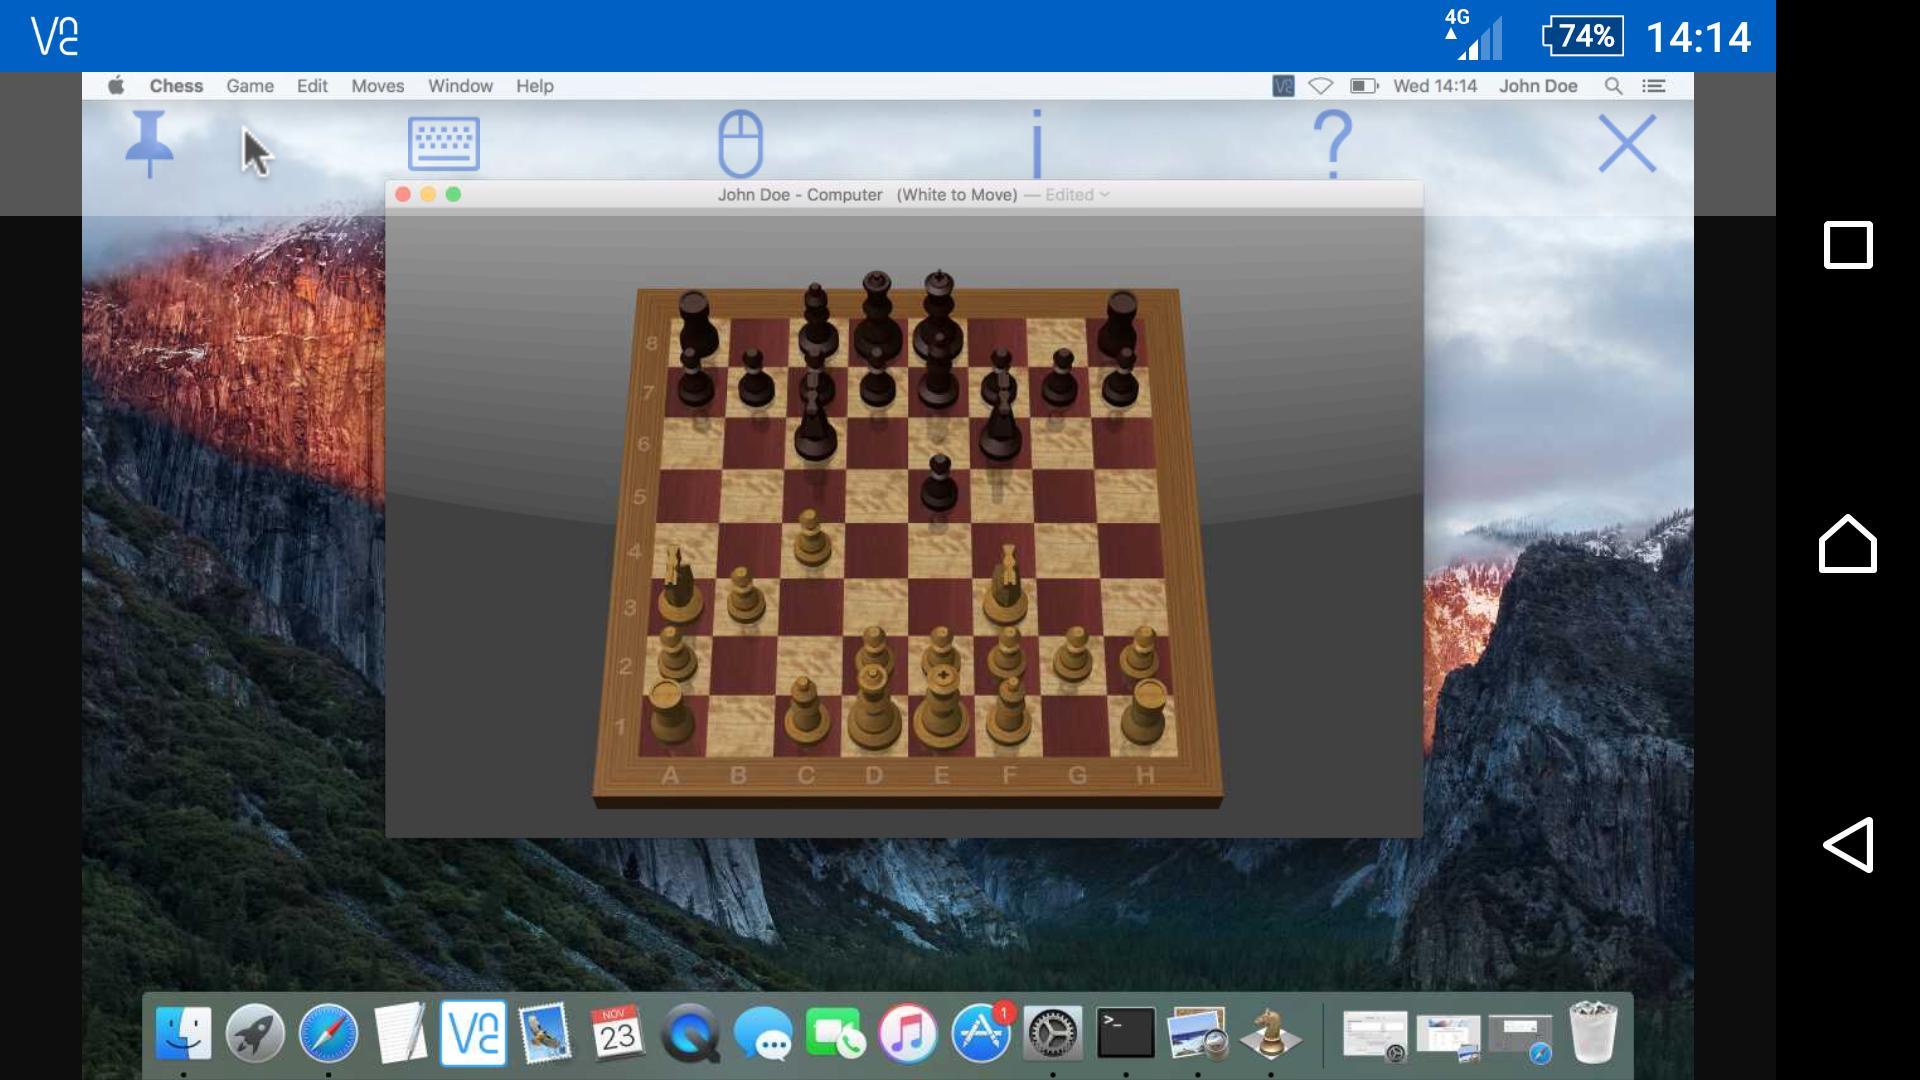 VNC Viewer Remote Desktop 3.6.1.42089 Screenshot 5